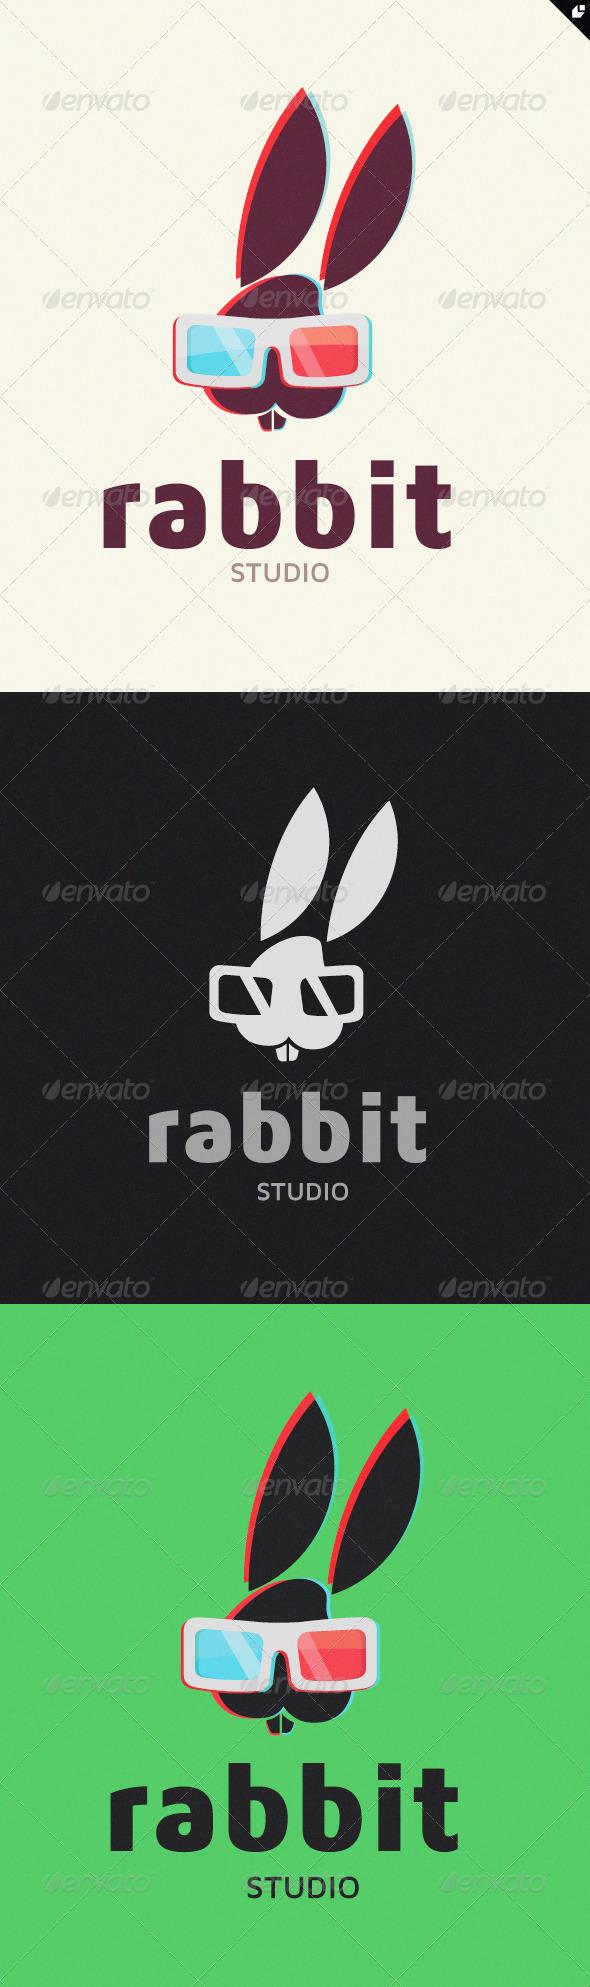 Rabbit Studio Logo - Animals Logo Templates